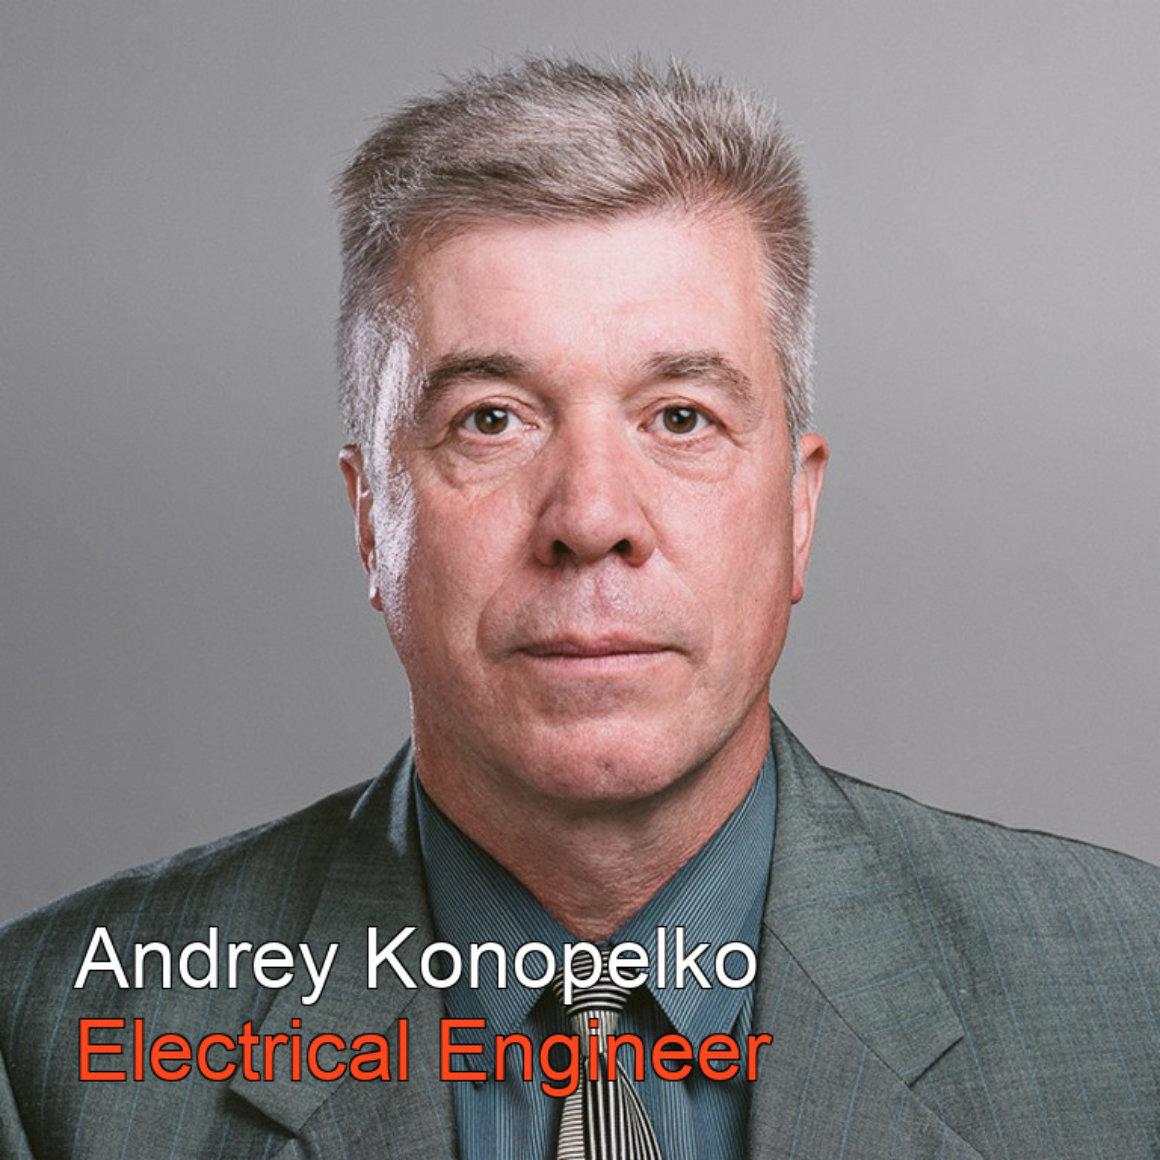 Andrey Konopelko BW